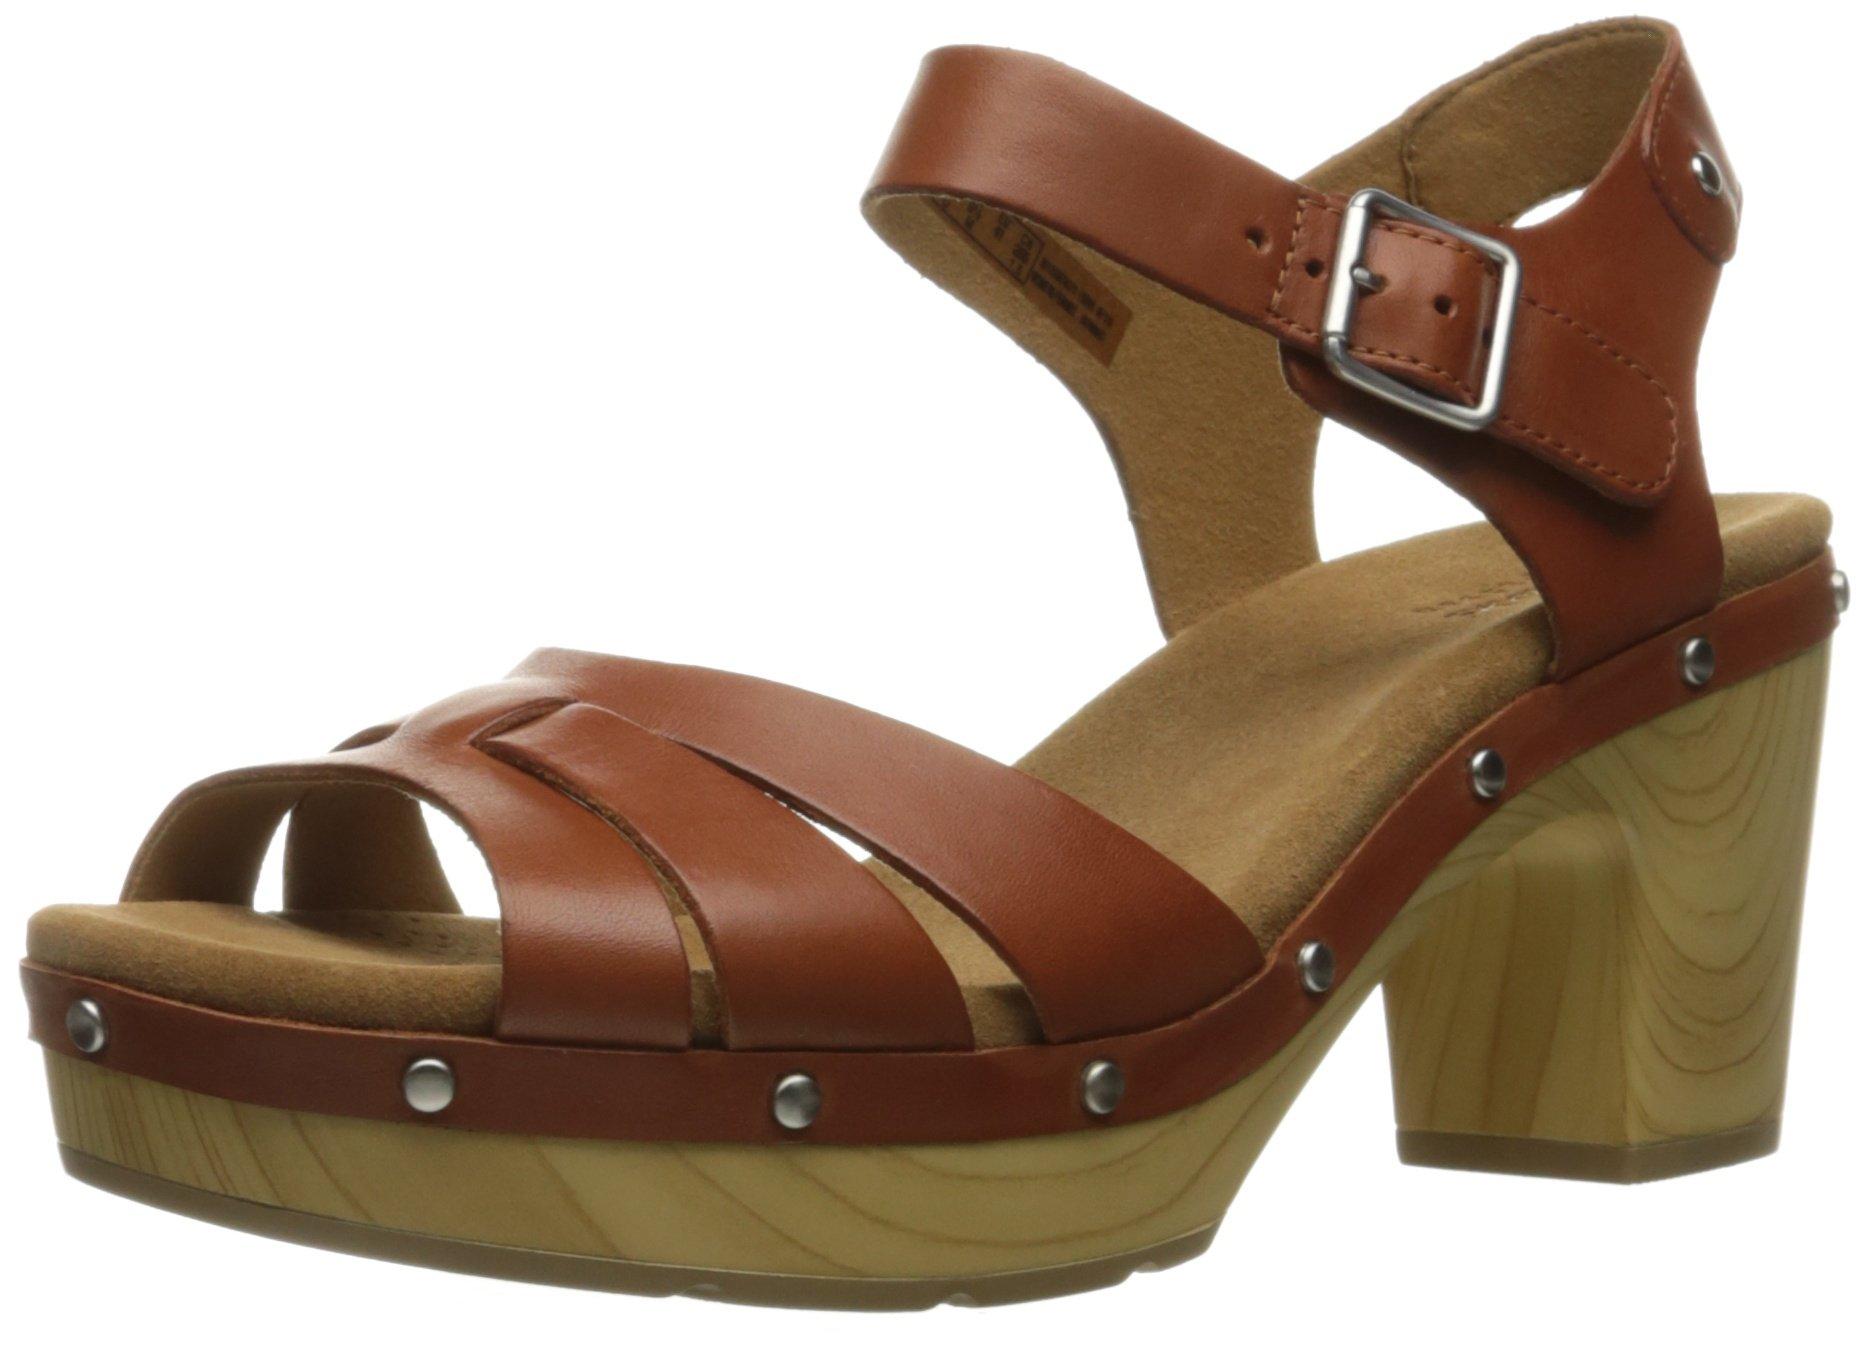 Clarks Women's Ledella Trail Heeled Sandal, Tan Leather, 9.5 M US by CLARKS